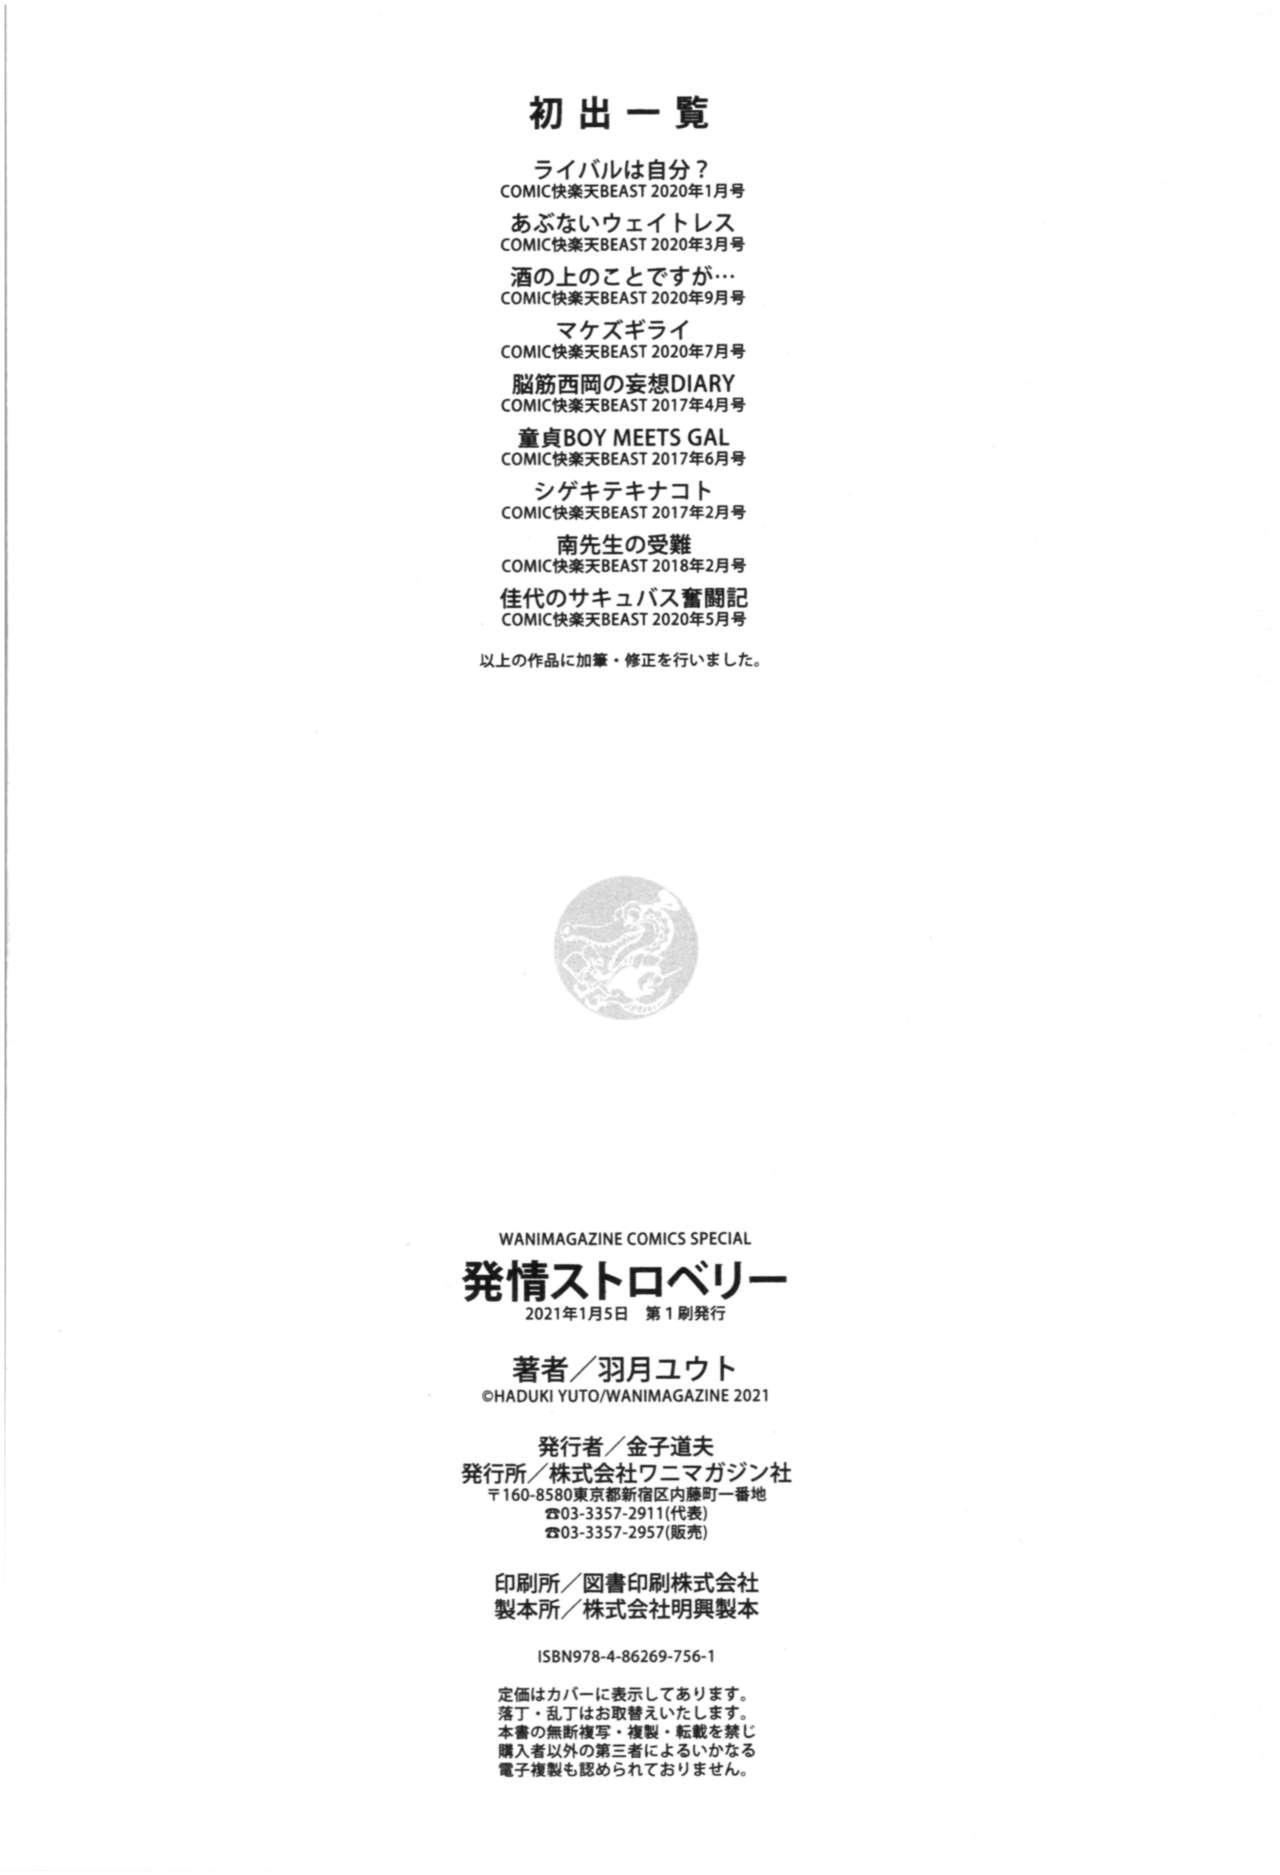 Hatsujou Strawberry - Hot Strawberry 178